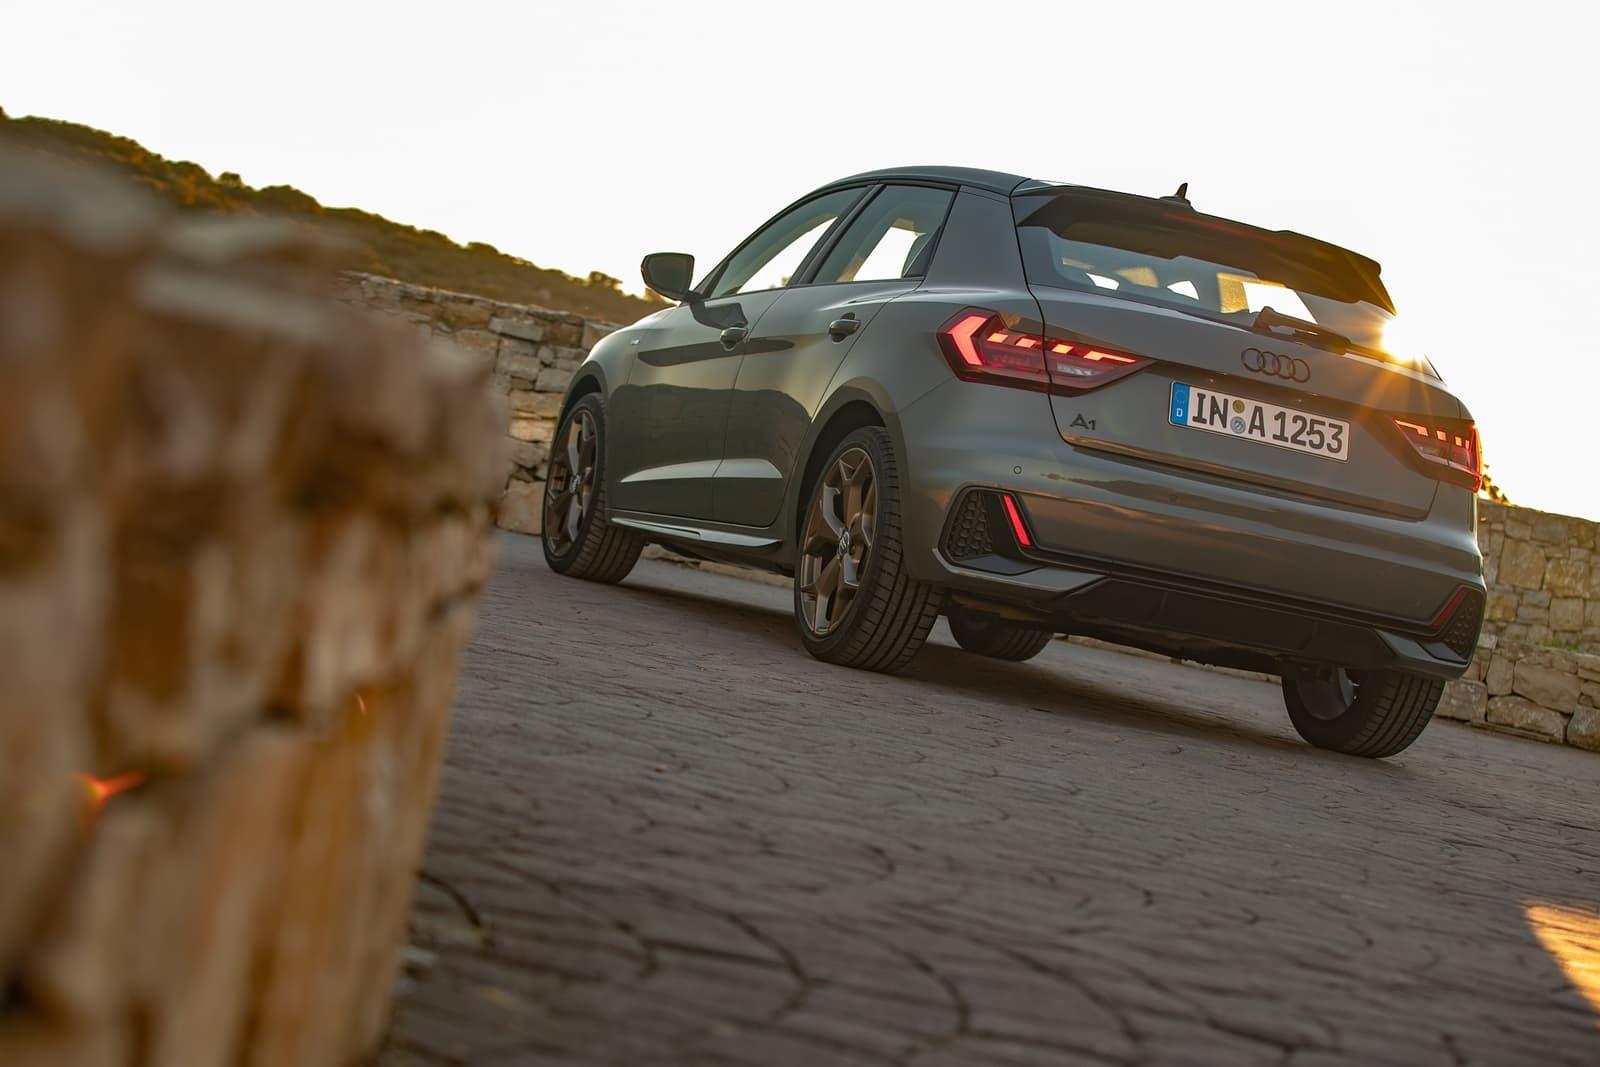 Audi A1 2019 1118 037